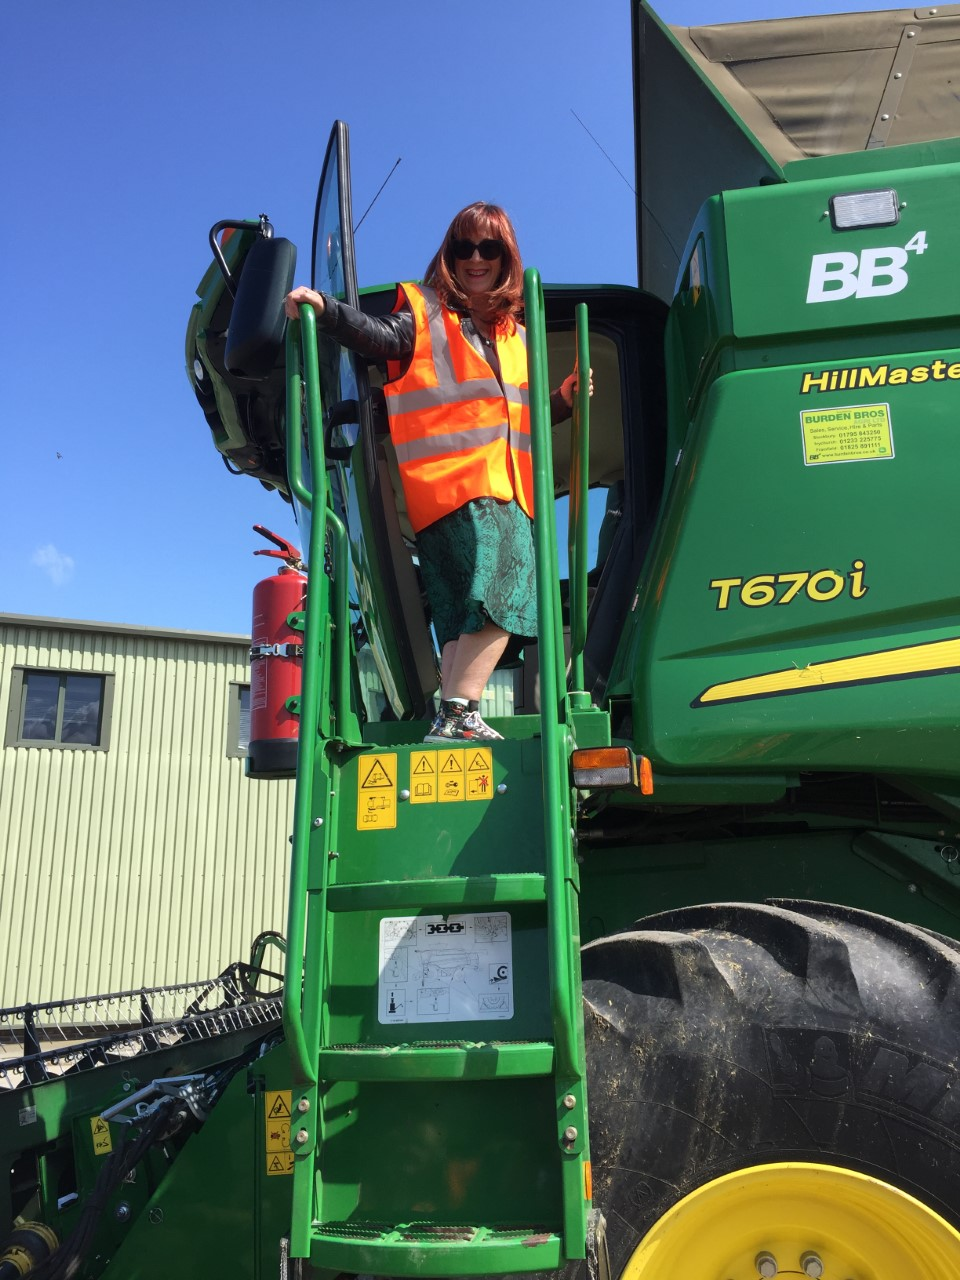 Climbing onto a combine harvester